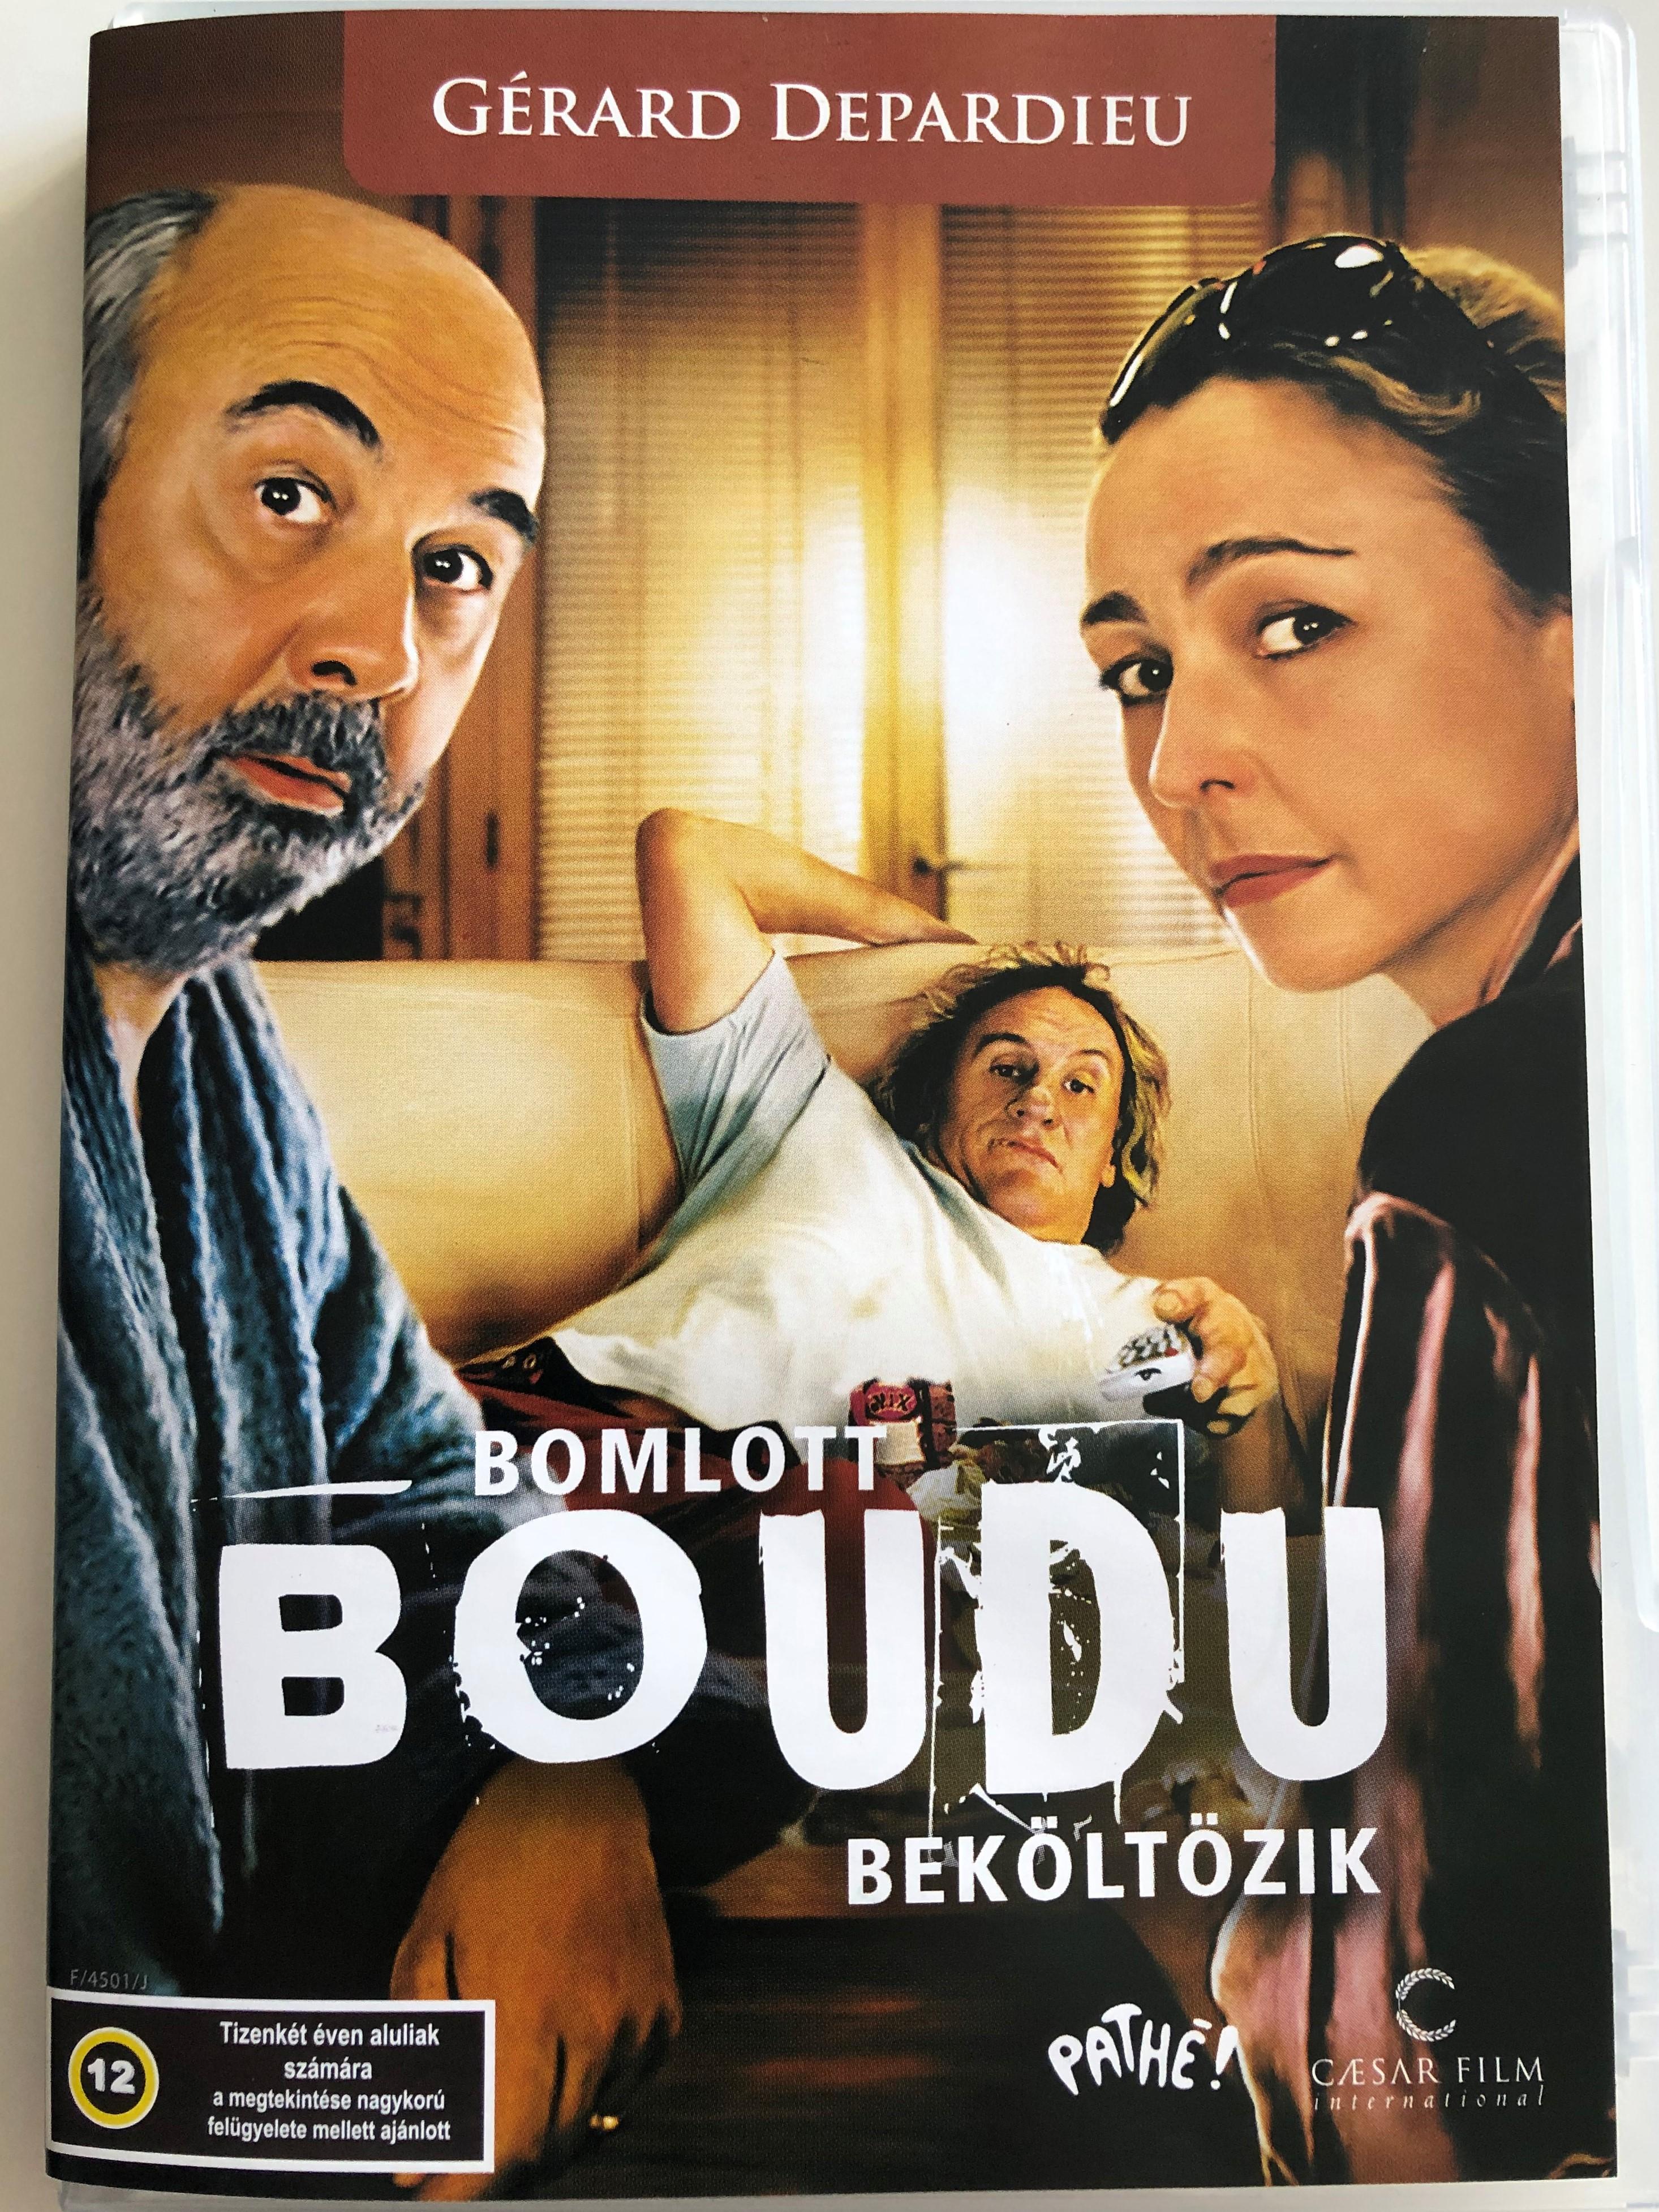 boudu-dvd-2005-bomlott-boudu-bek-lt-zik-directed-by-g-rard-jugnot-1.jpg